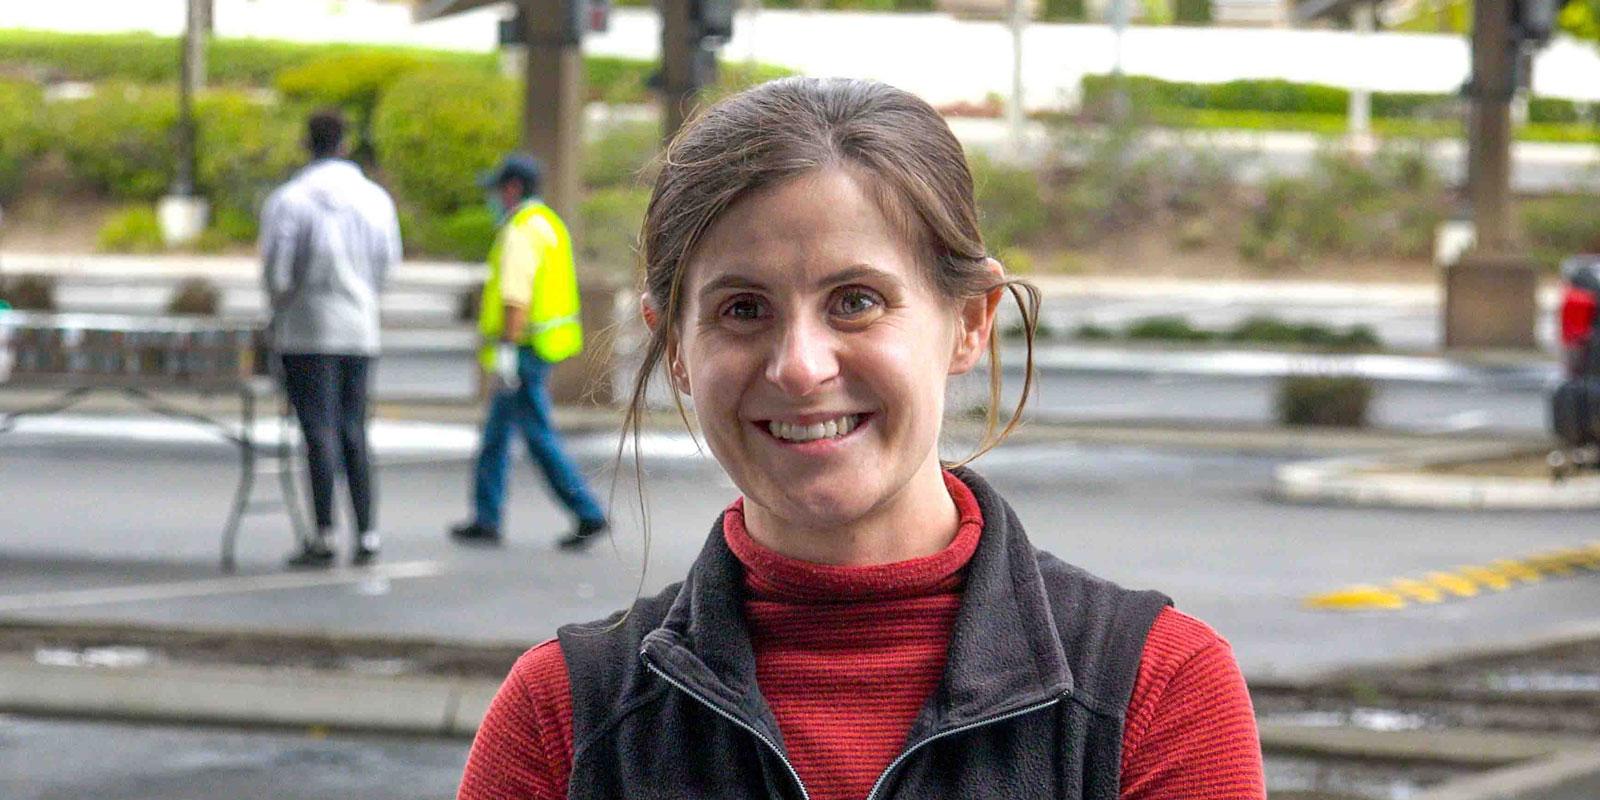 USD alumna Deanna Wolf '12 (BA) of Catholic Relief Services